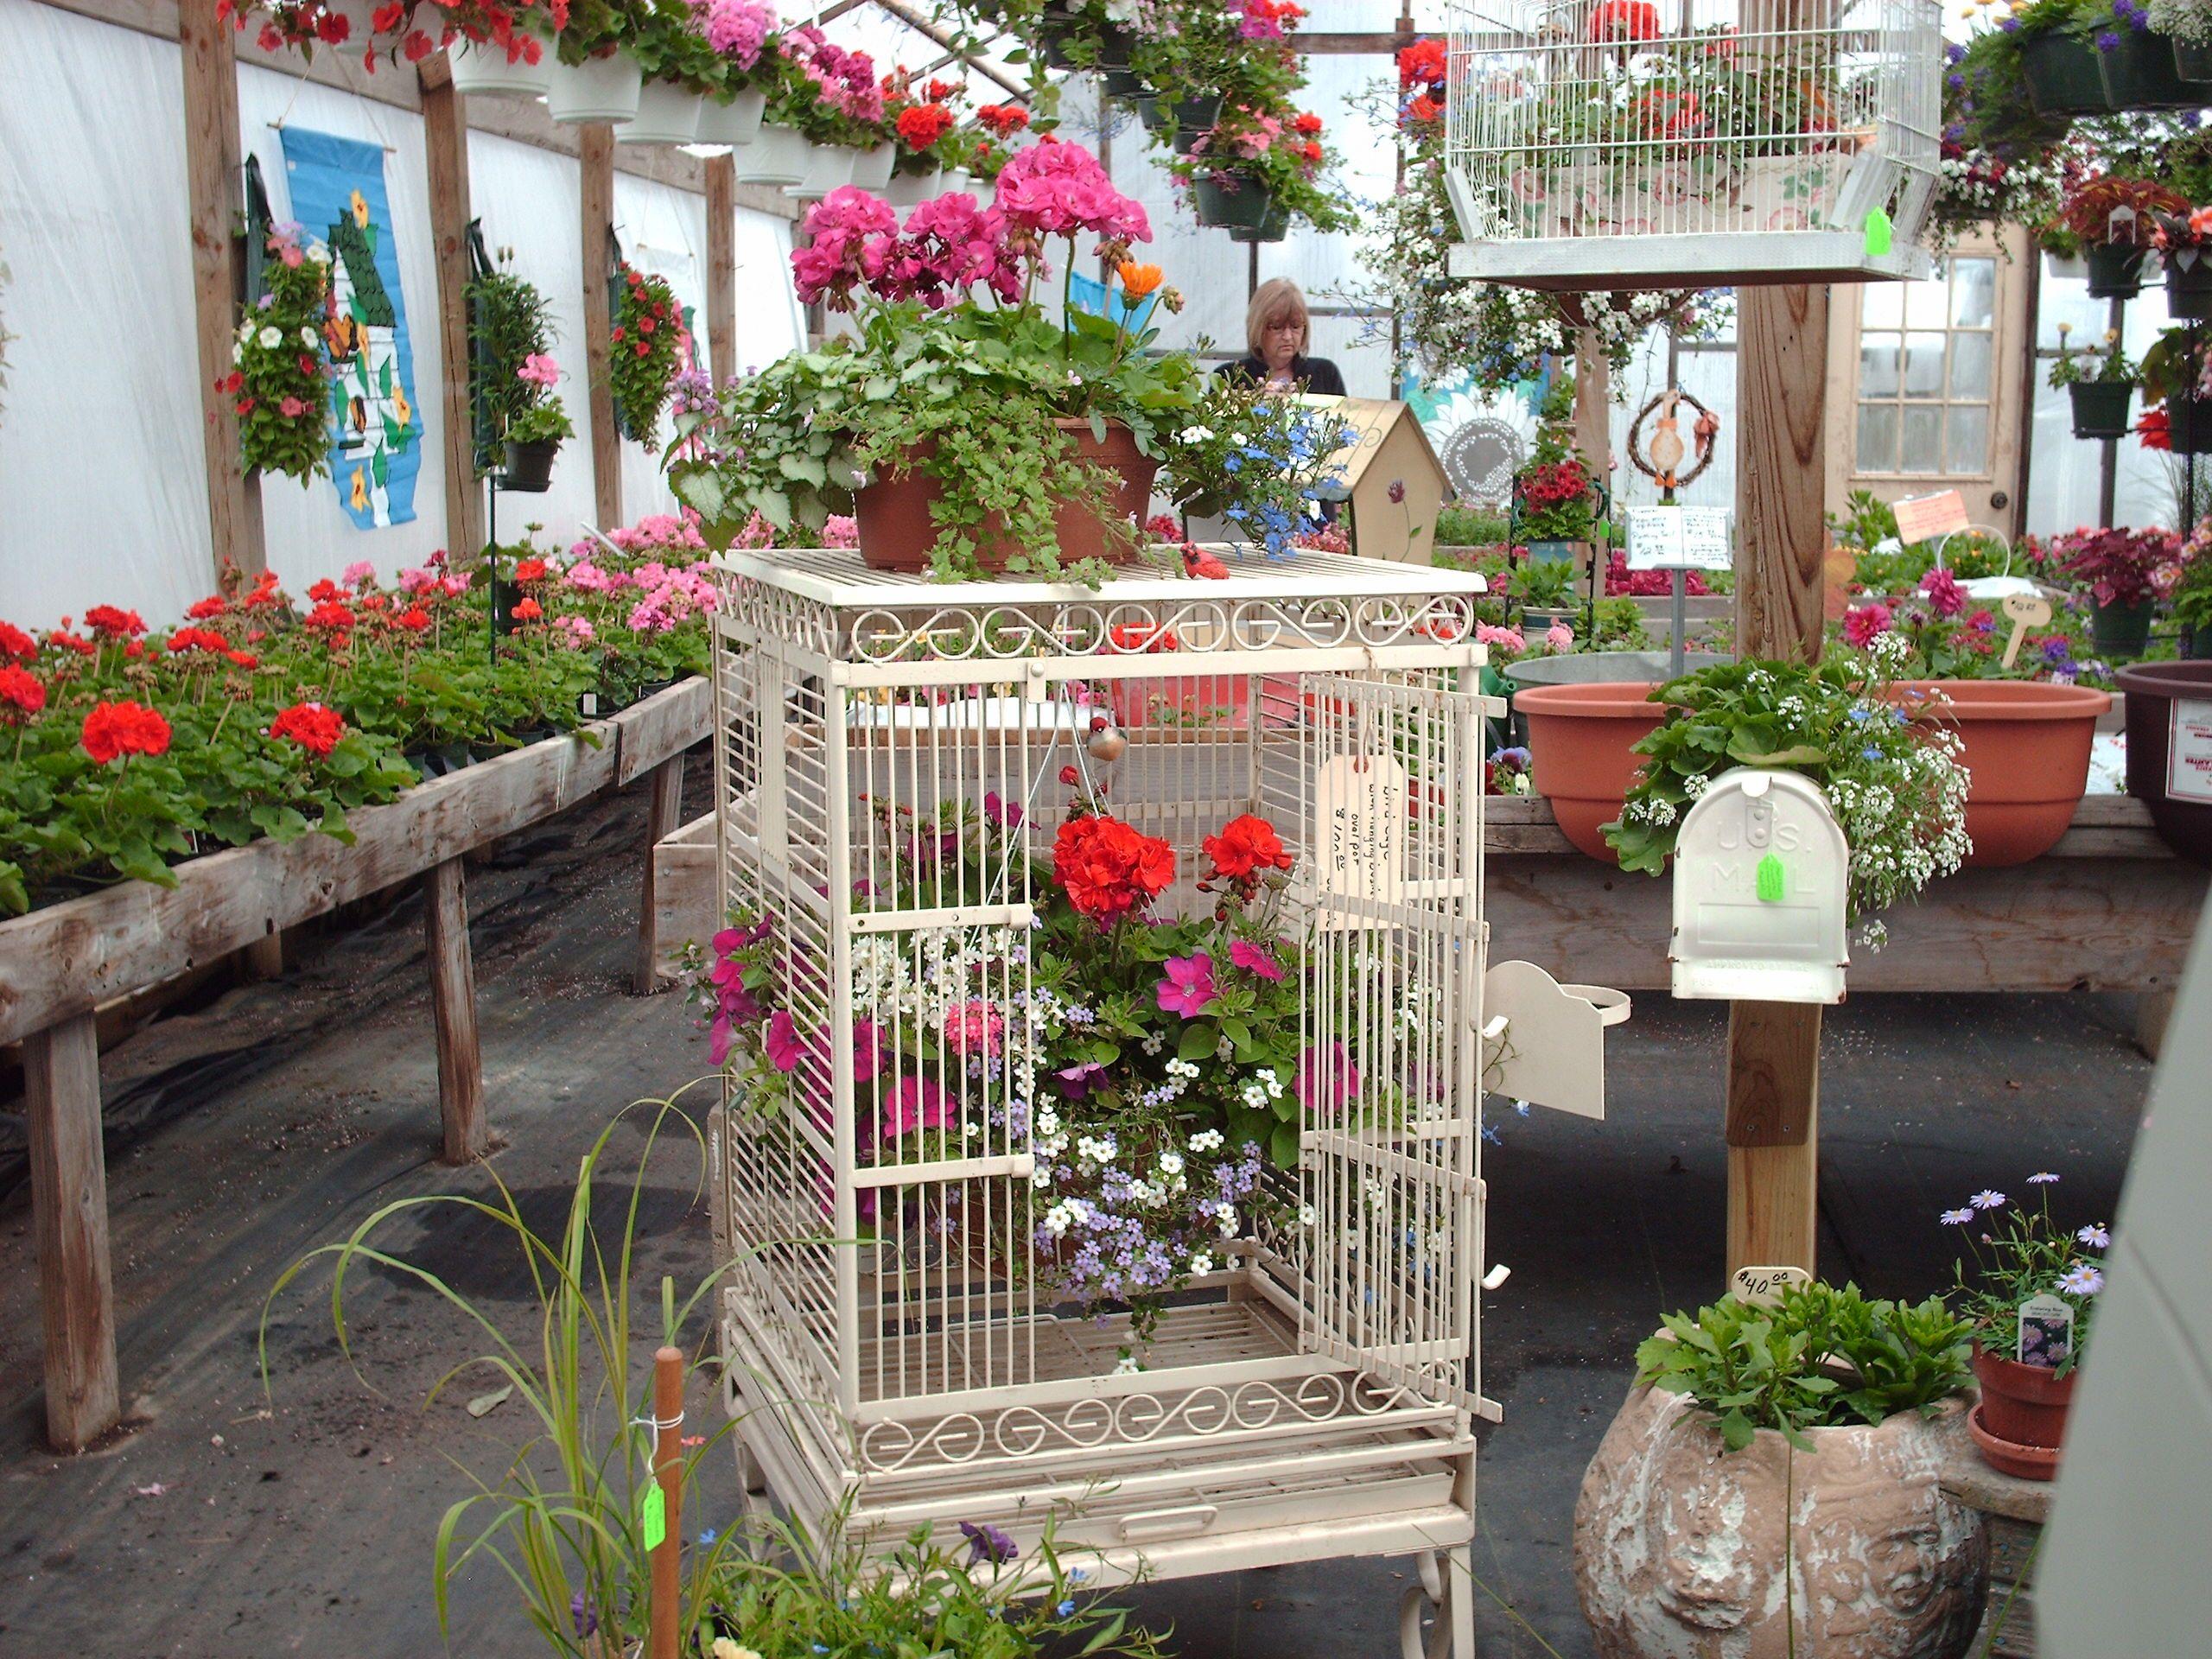 Charmant Gustafsonu0027s Greenhouse And Garden Essentials, Ludington, MI